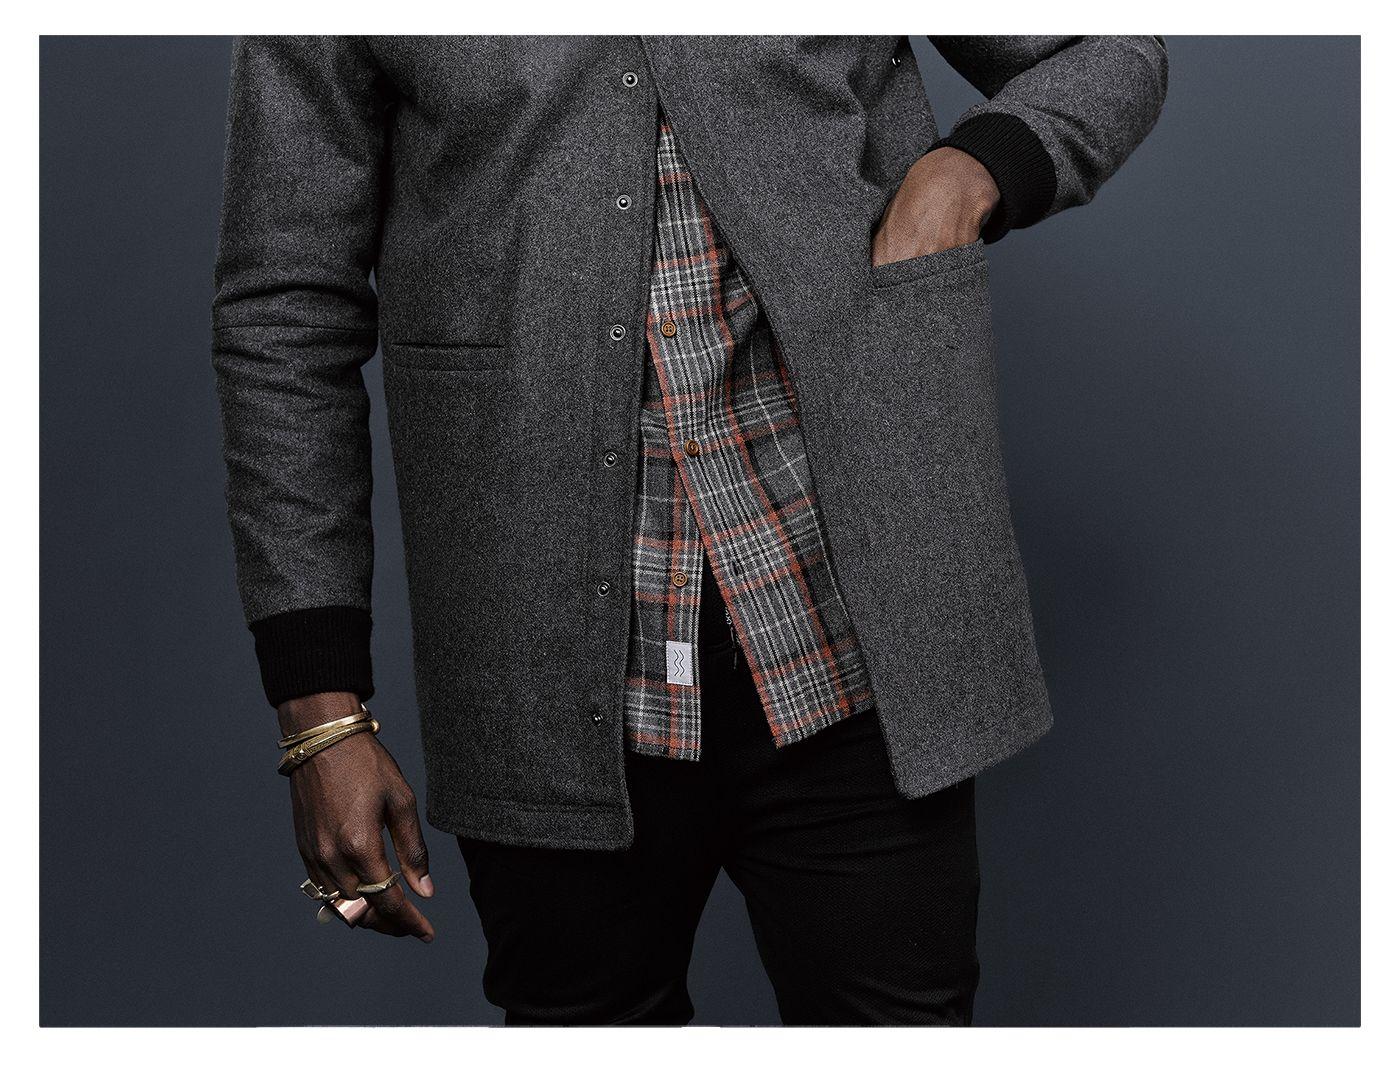 I Love Ugly x Street Etiquette editorial. #iloveugly #streetetiquette #menswear #portrait #photography #design #streetwear #snobshots #vsco #vscocam #luxurystreetwear #fashion. Photos by: https://instagram.com/shadowlandsnz/